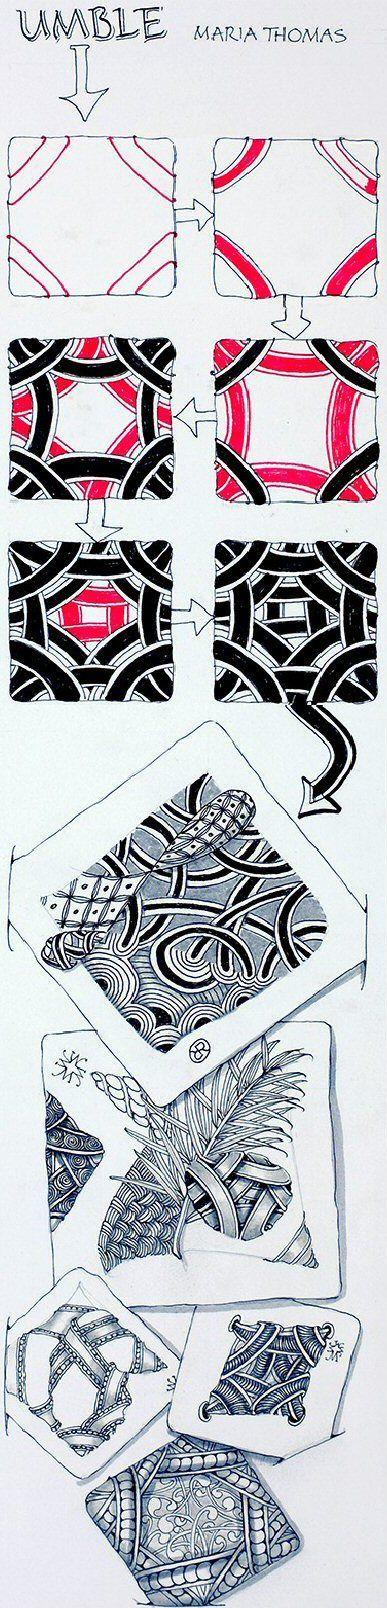 Umble zentangle tangle by founder maria thomas